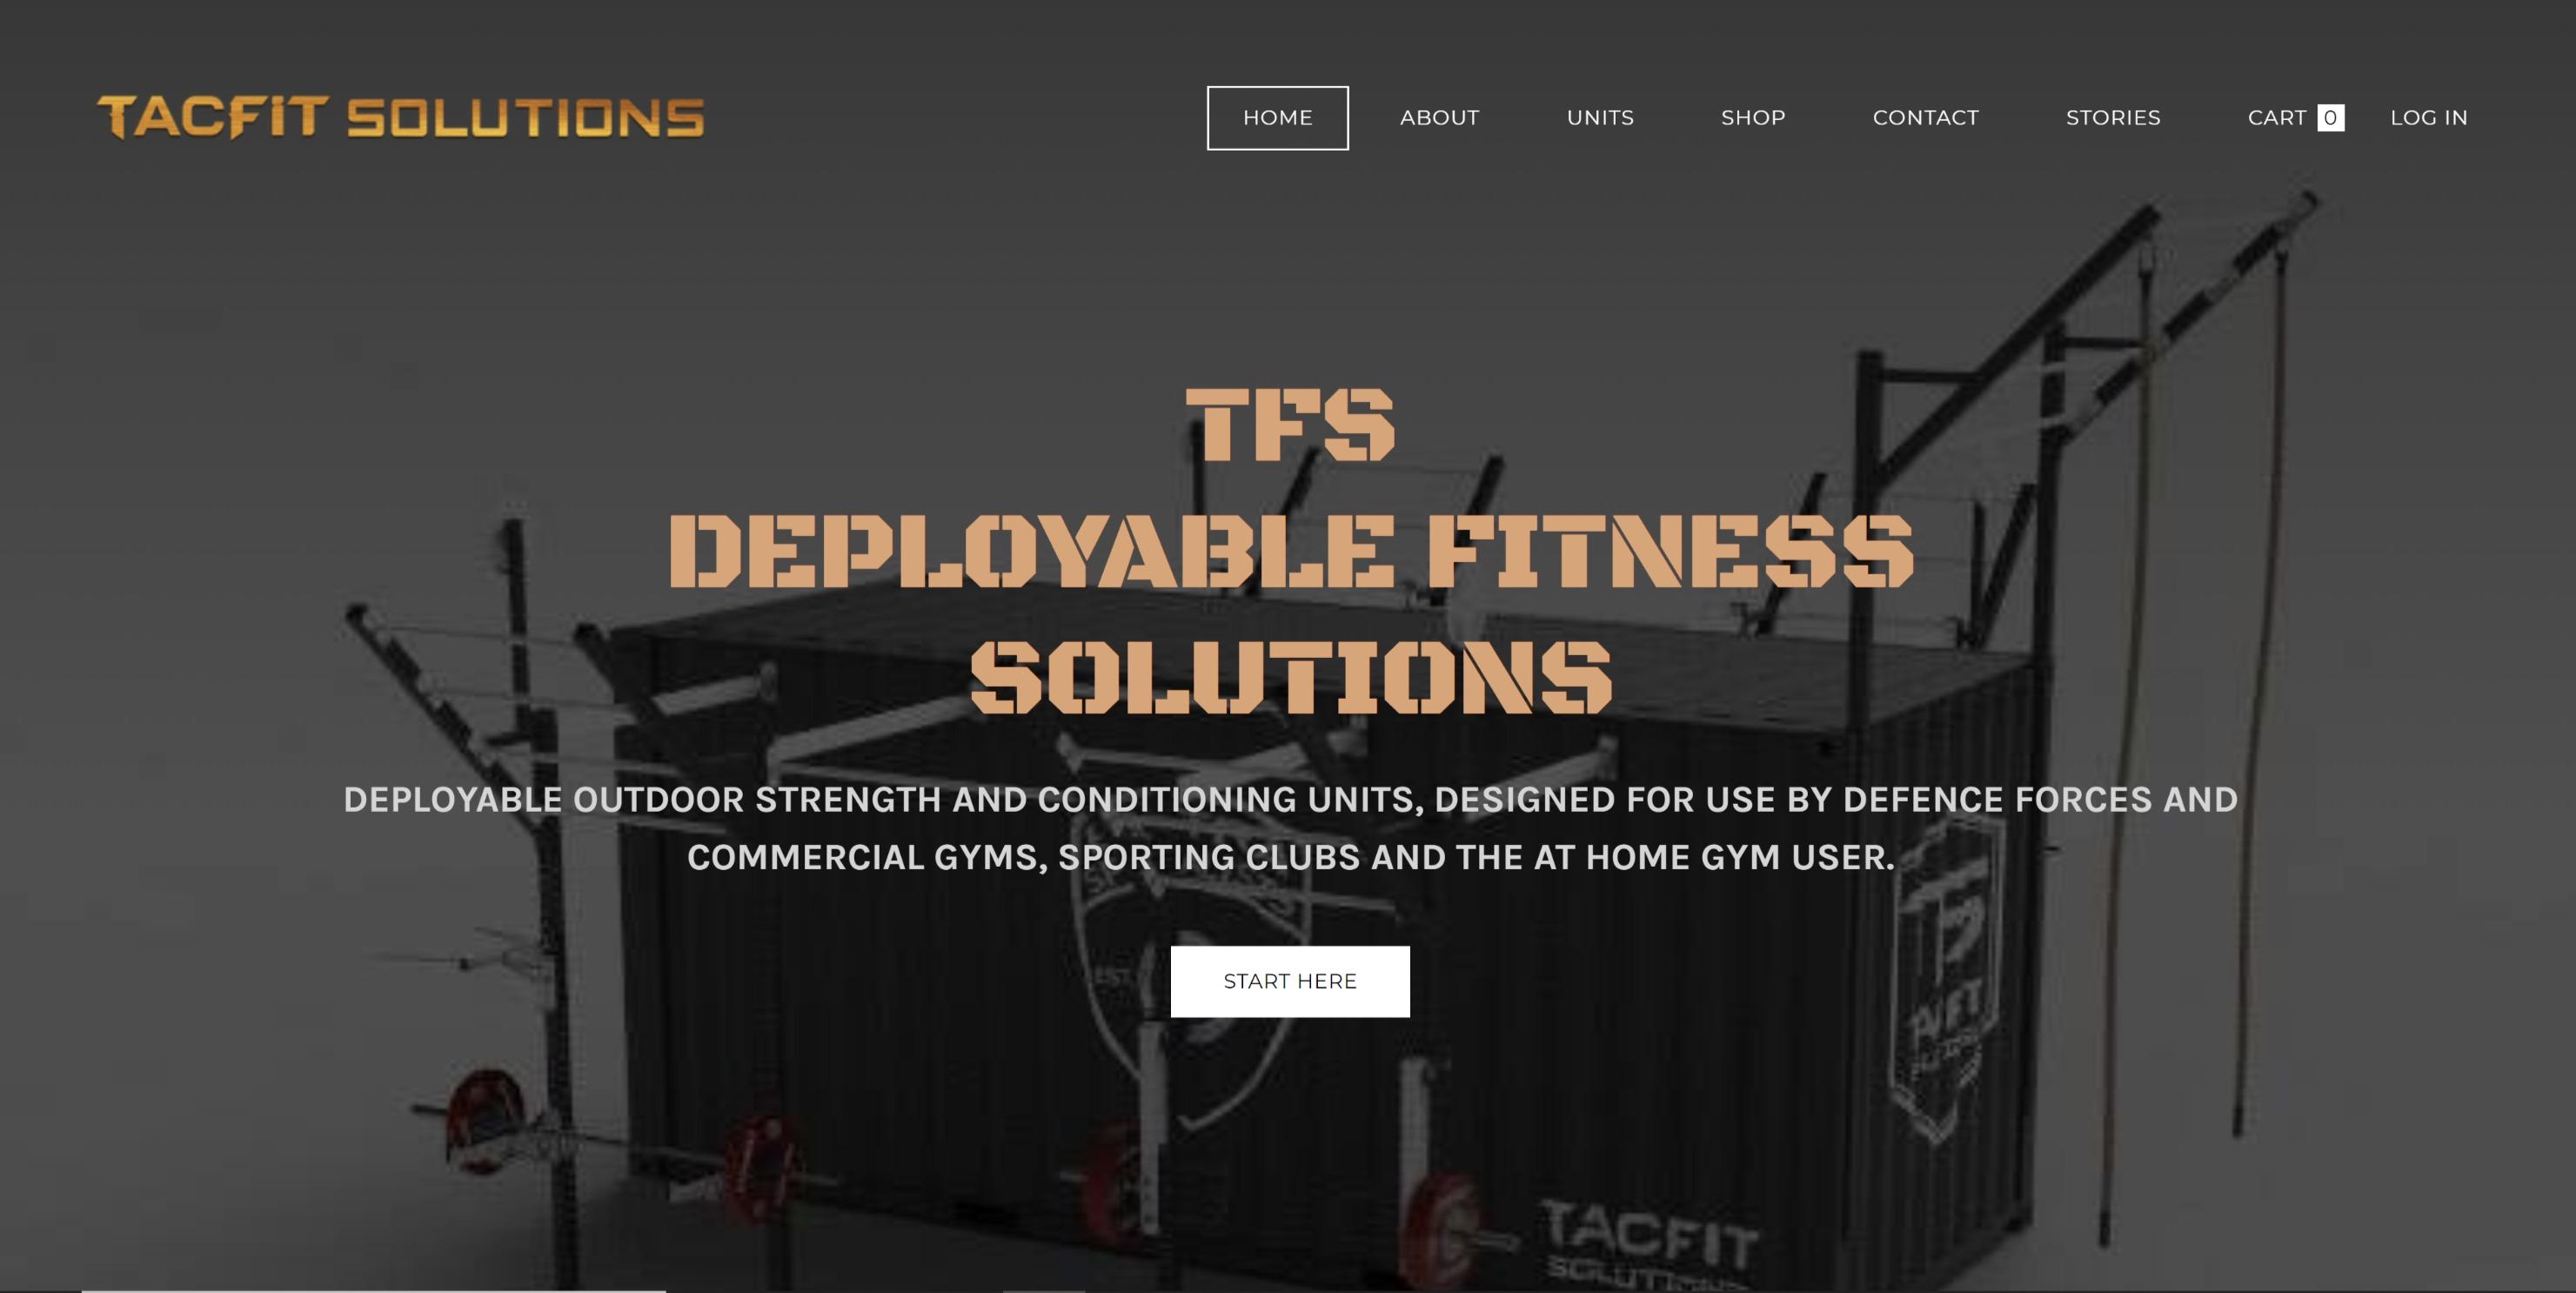 Tacfit Solutions